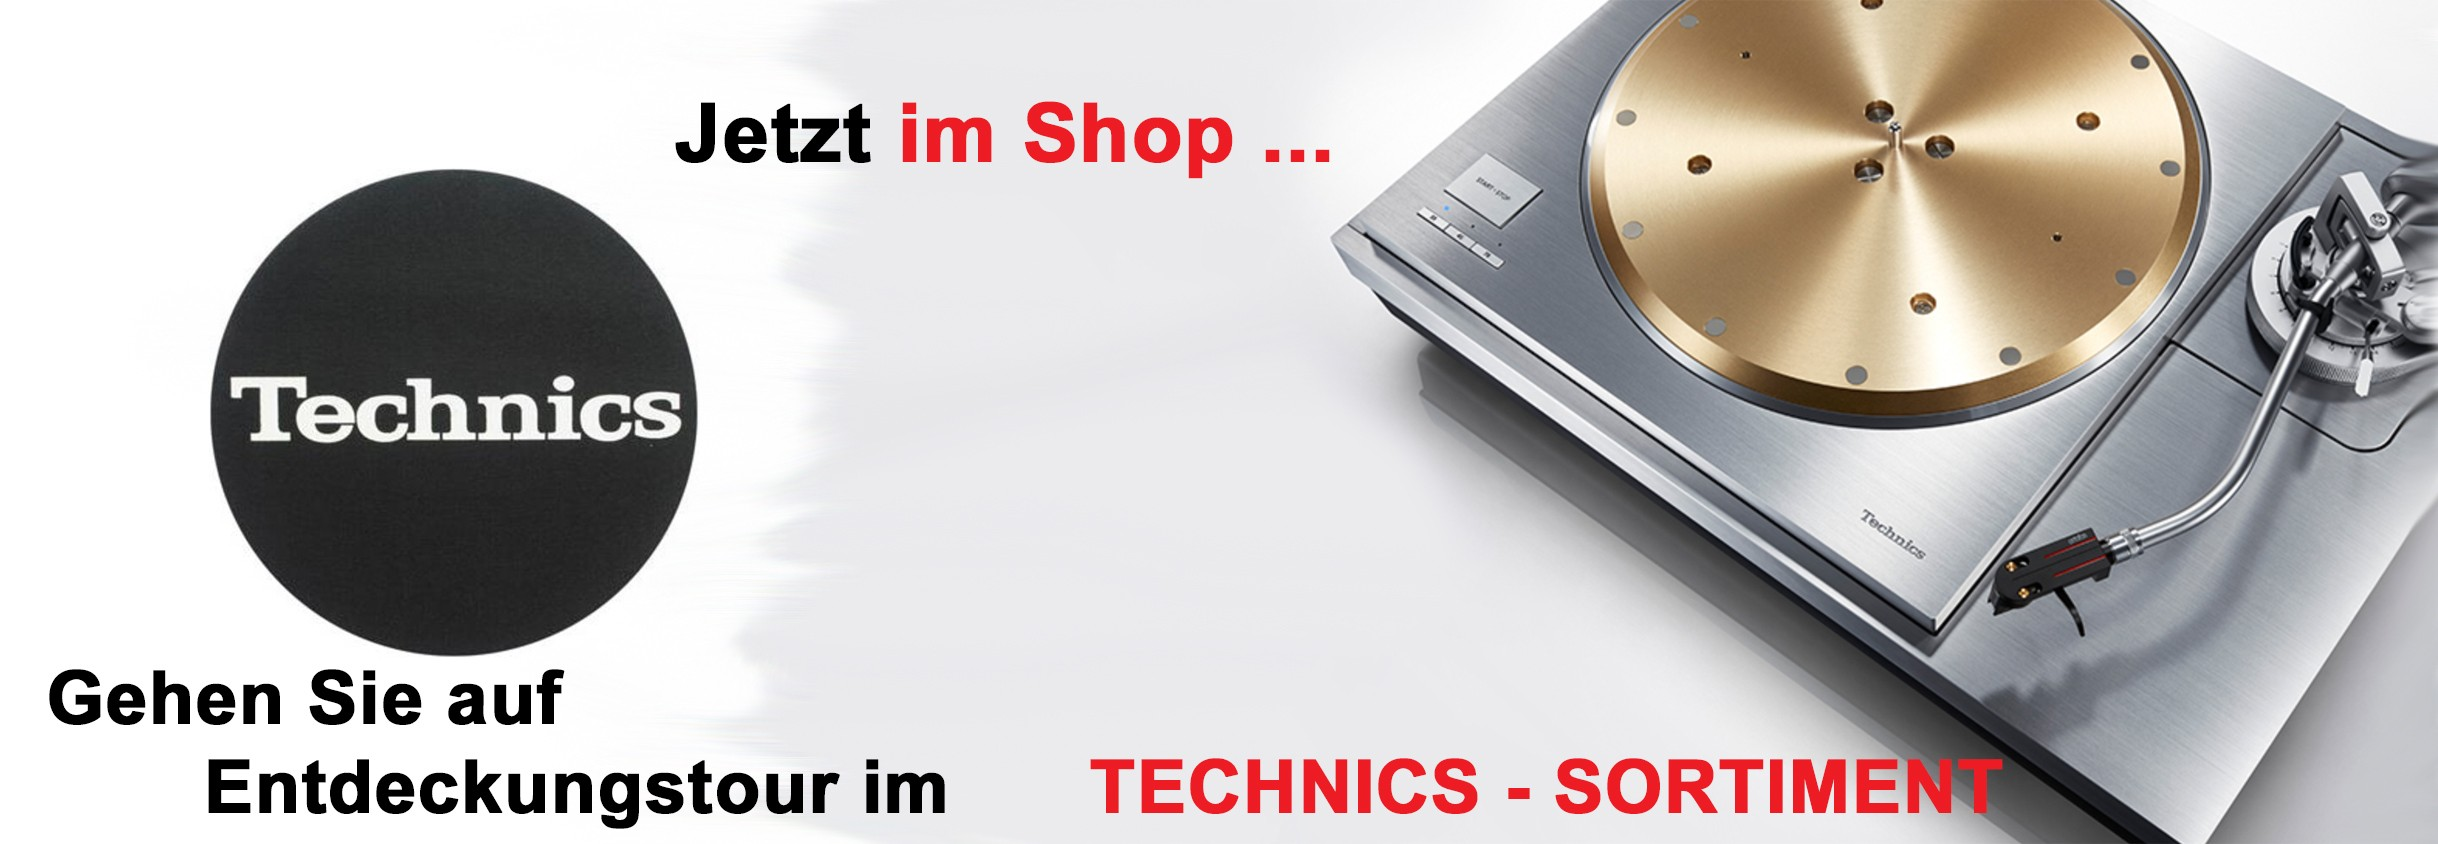 Technics im Shop